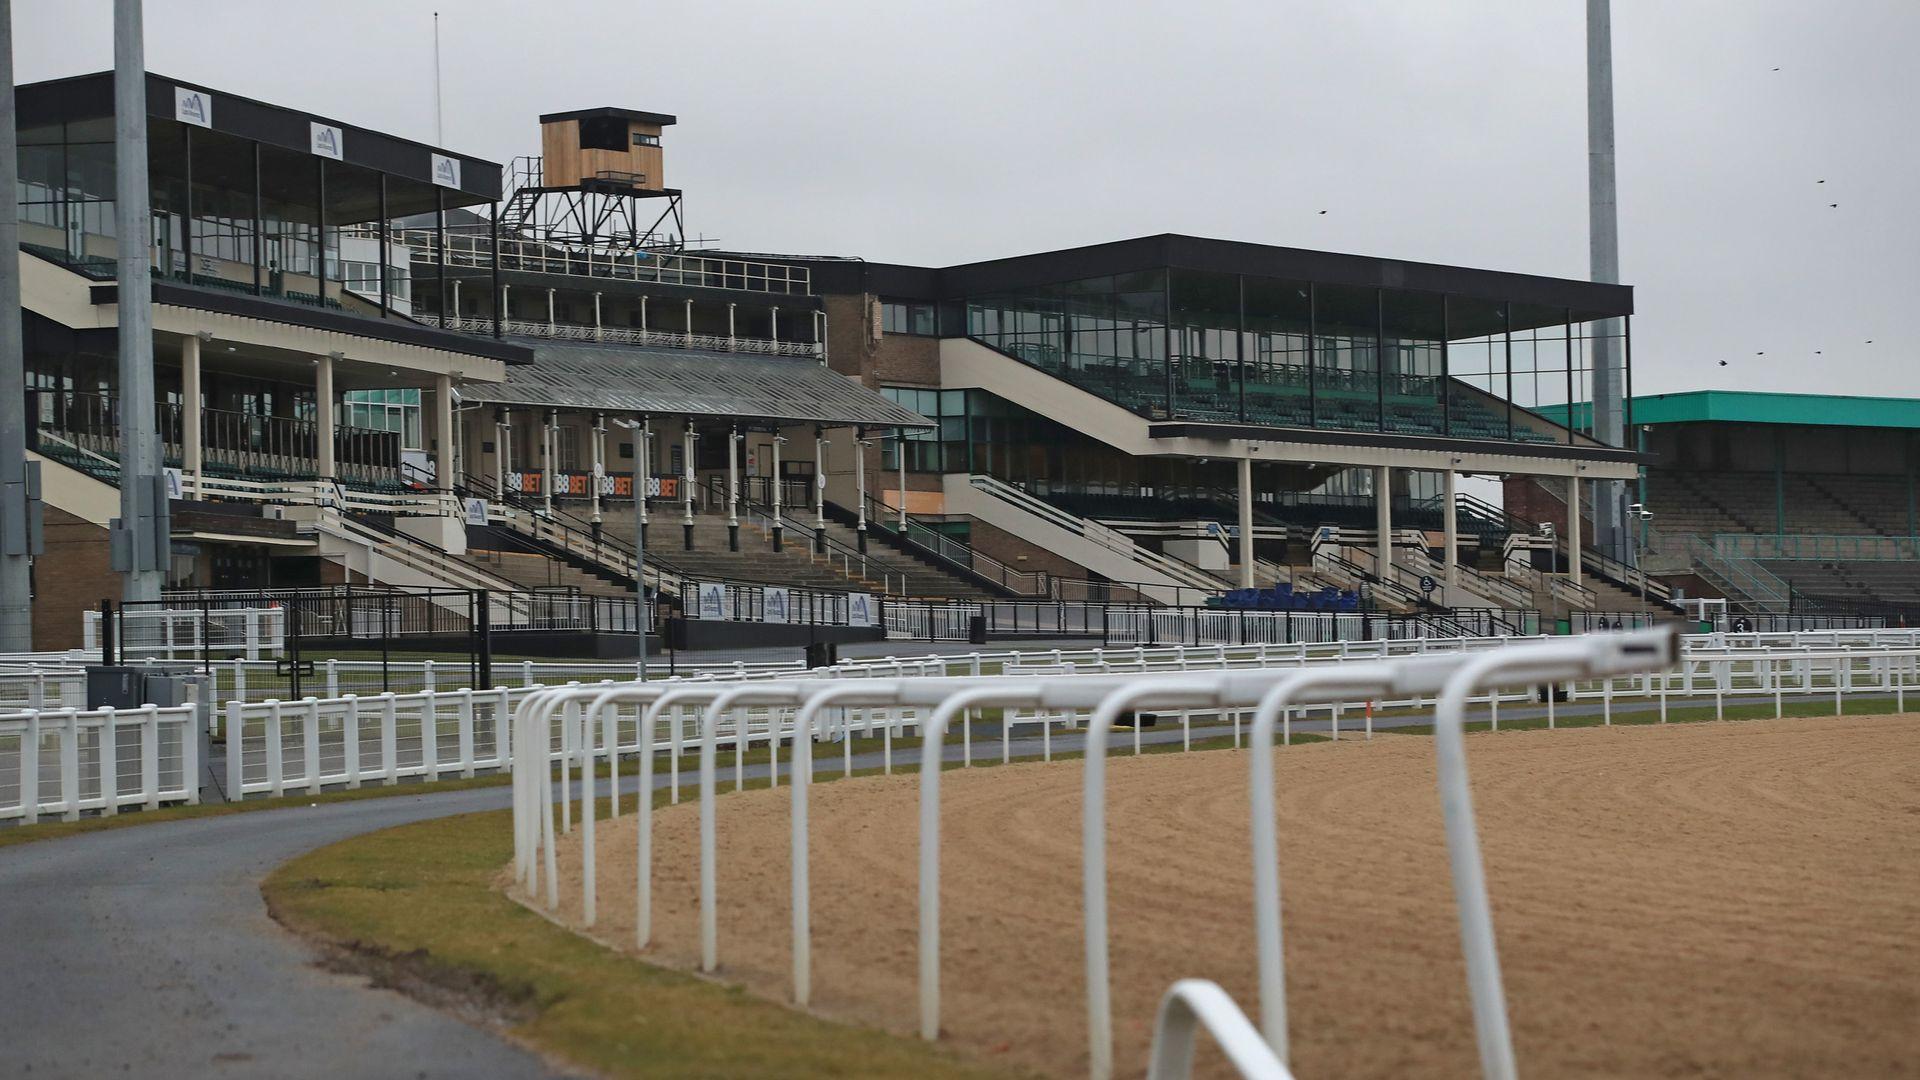 Monday racing return confirmed - sky sports